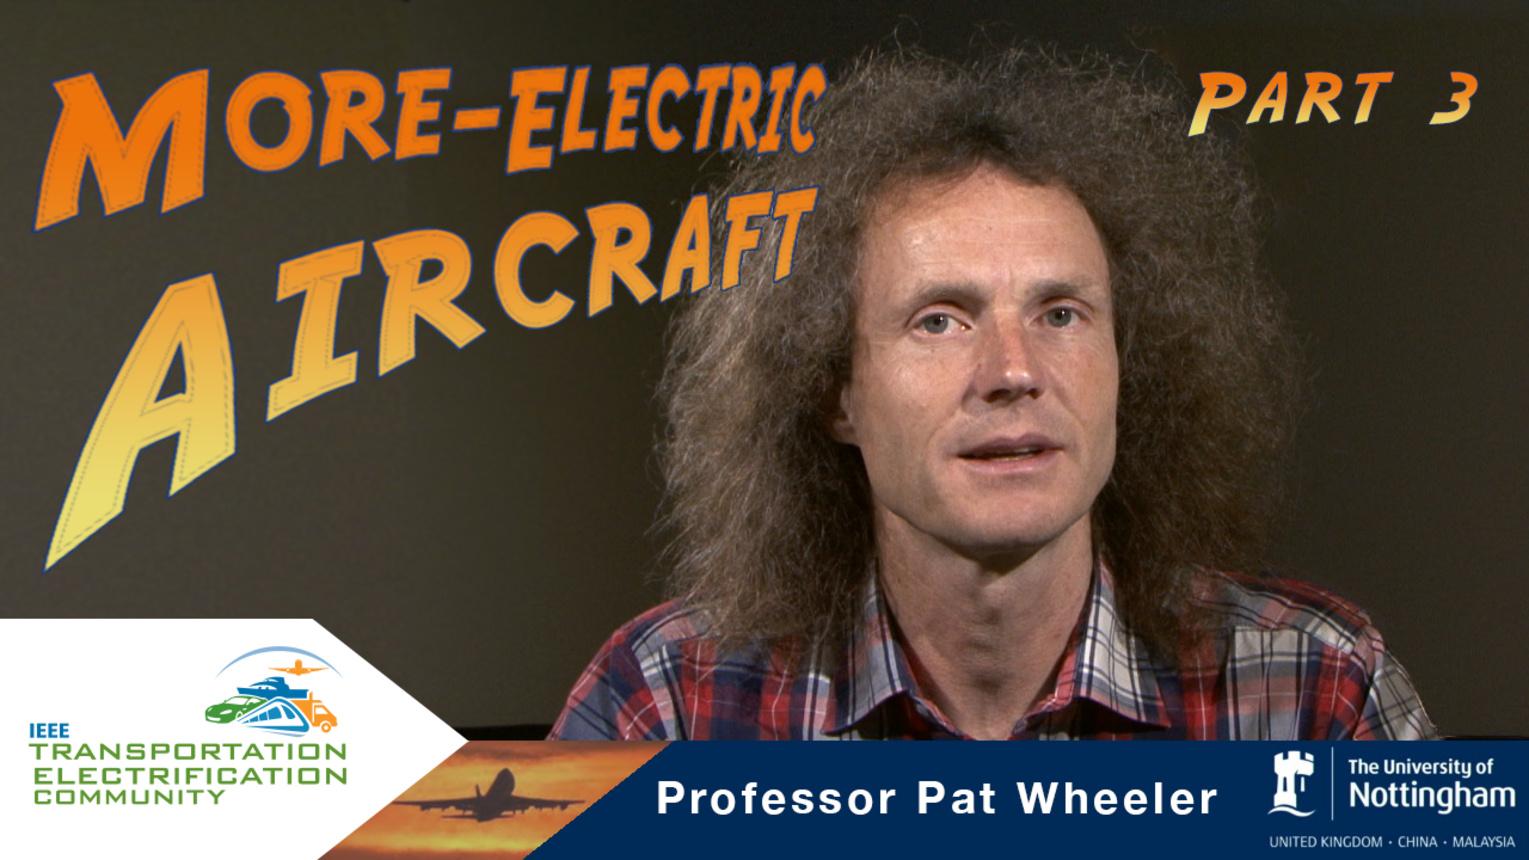 ECCE-2015- Pat Wheeler - More Electric Aircraft - Part 3